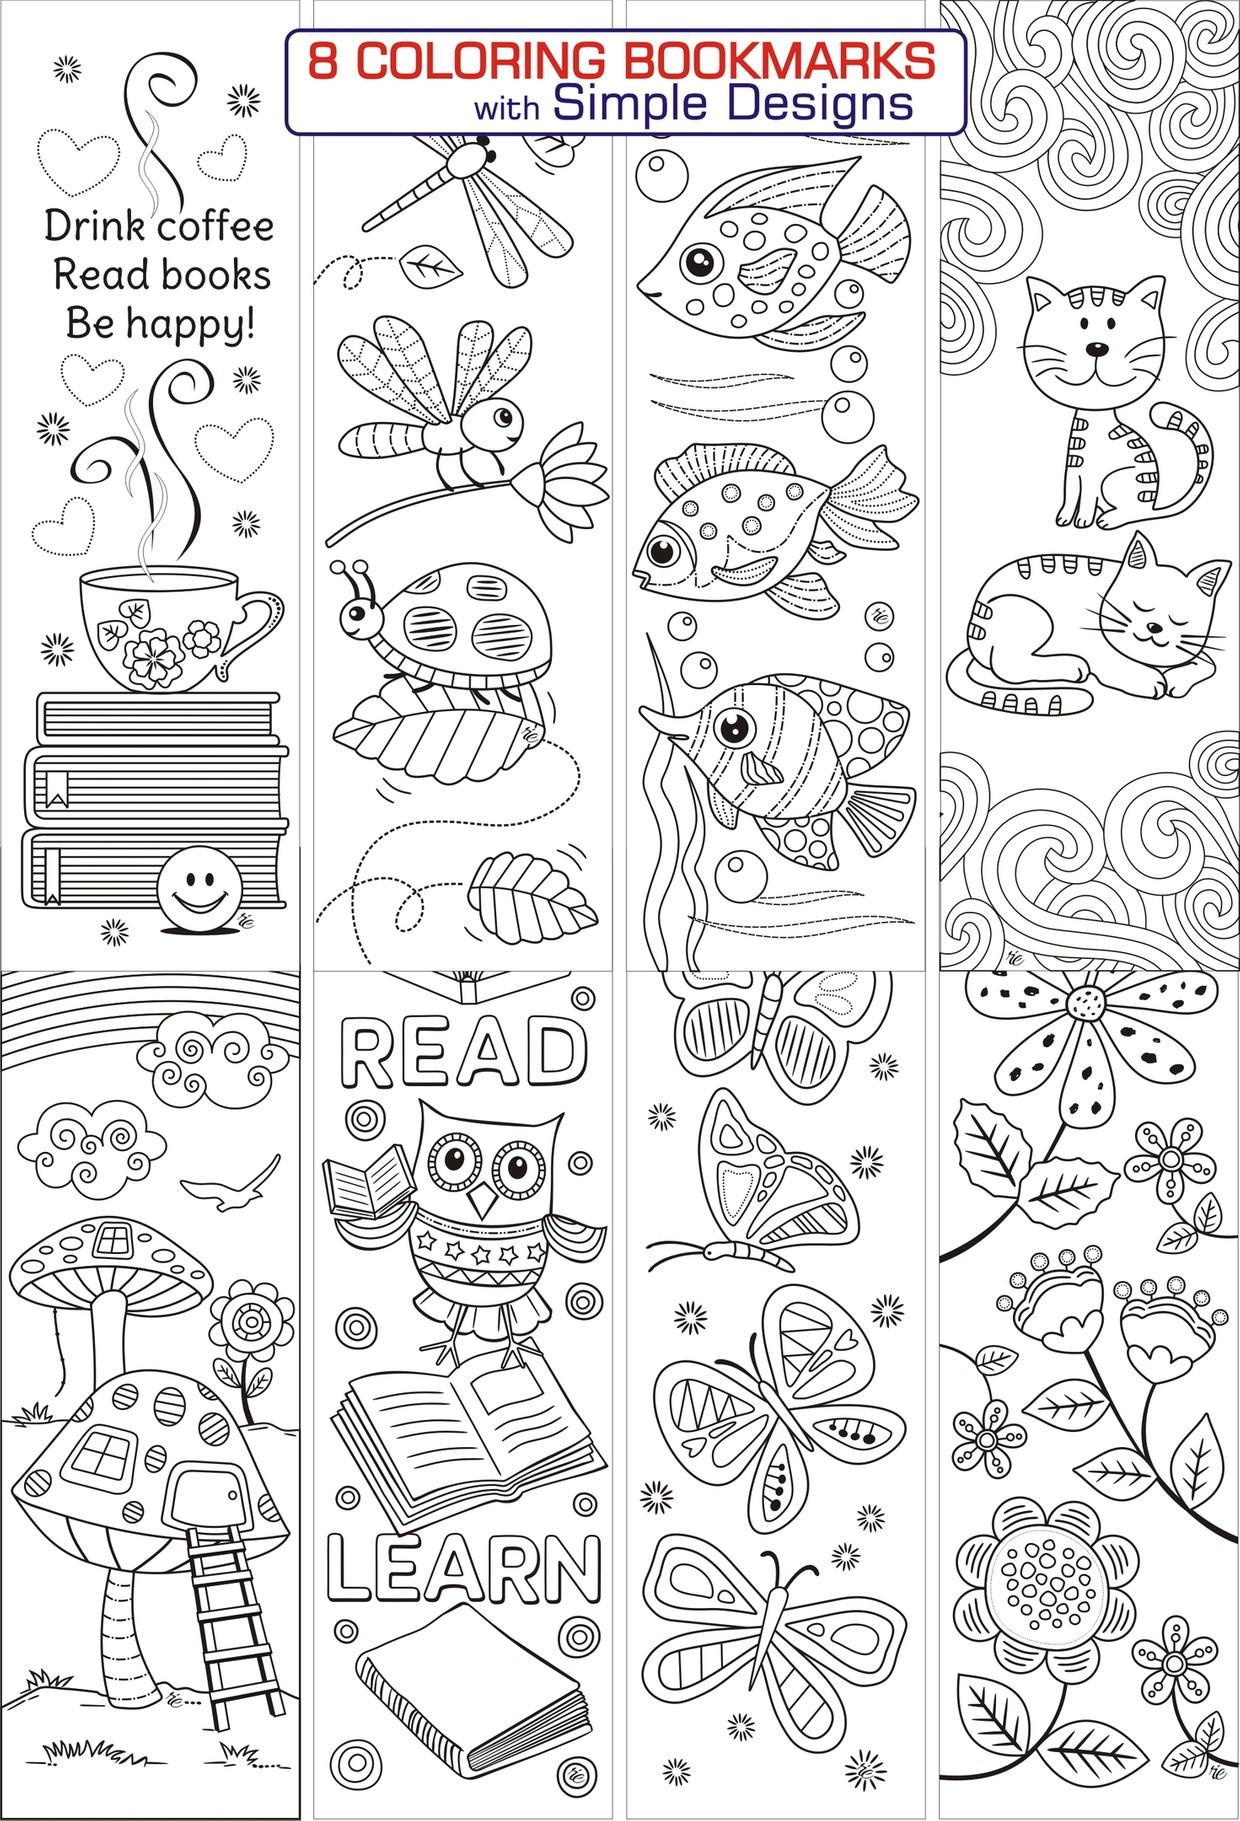 8 Simple Designs Coloring Bookmarks - RicLDP ArtworksTwitterPinterest